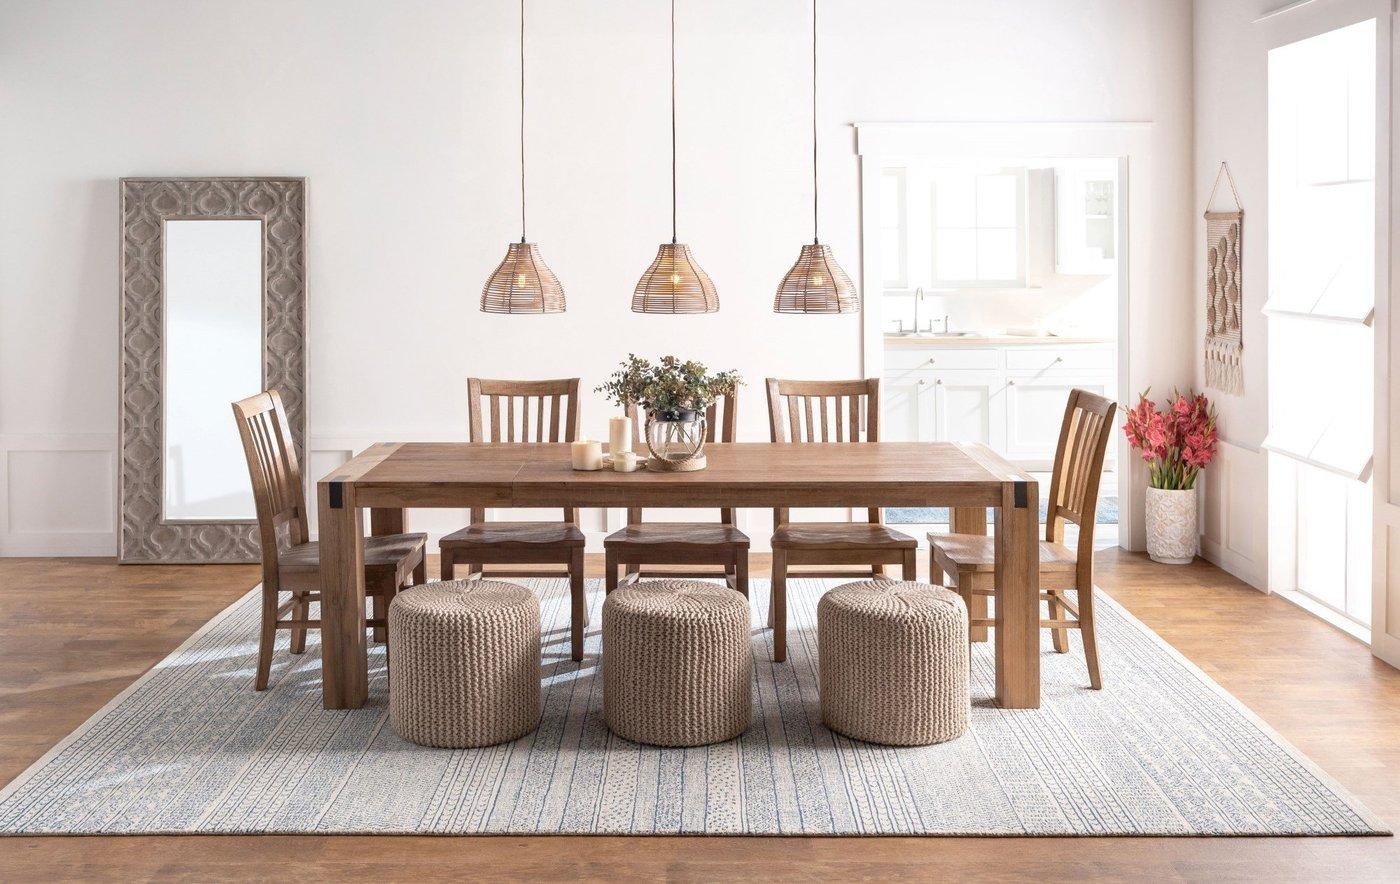 Casually Formal Dining Room Decor Ideas